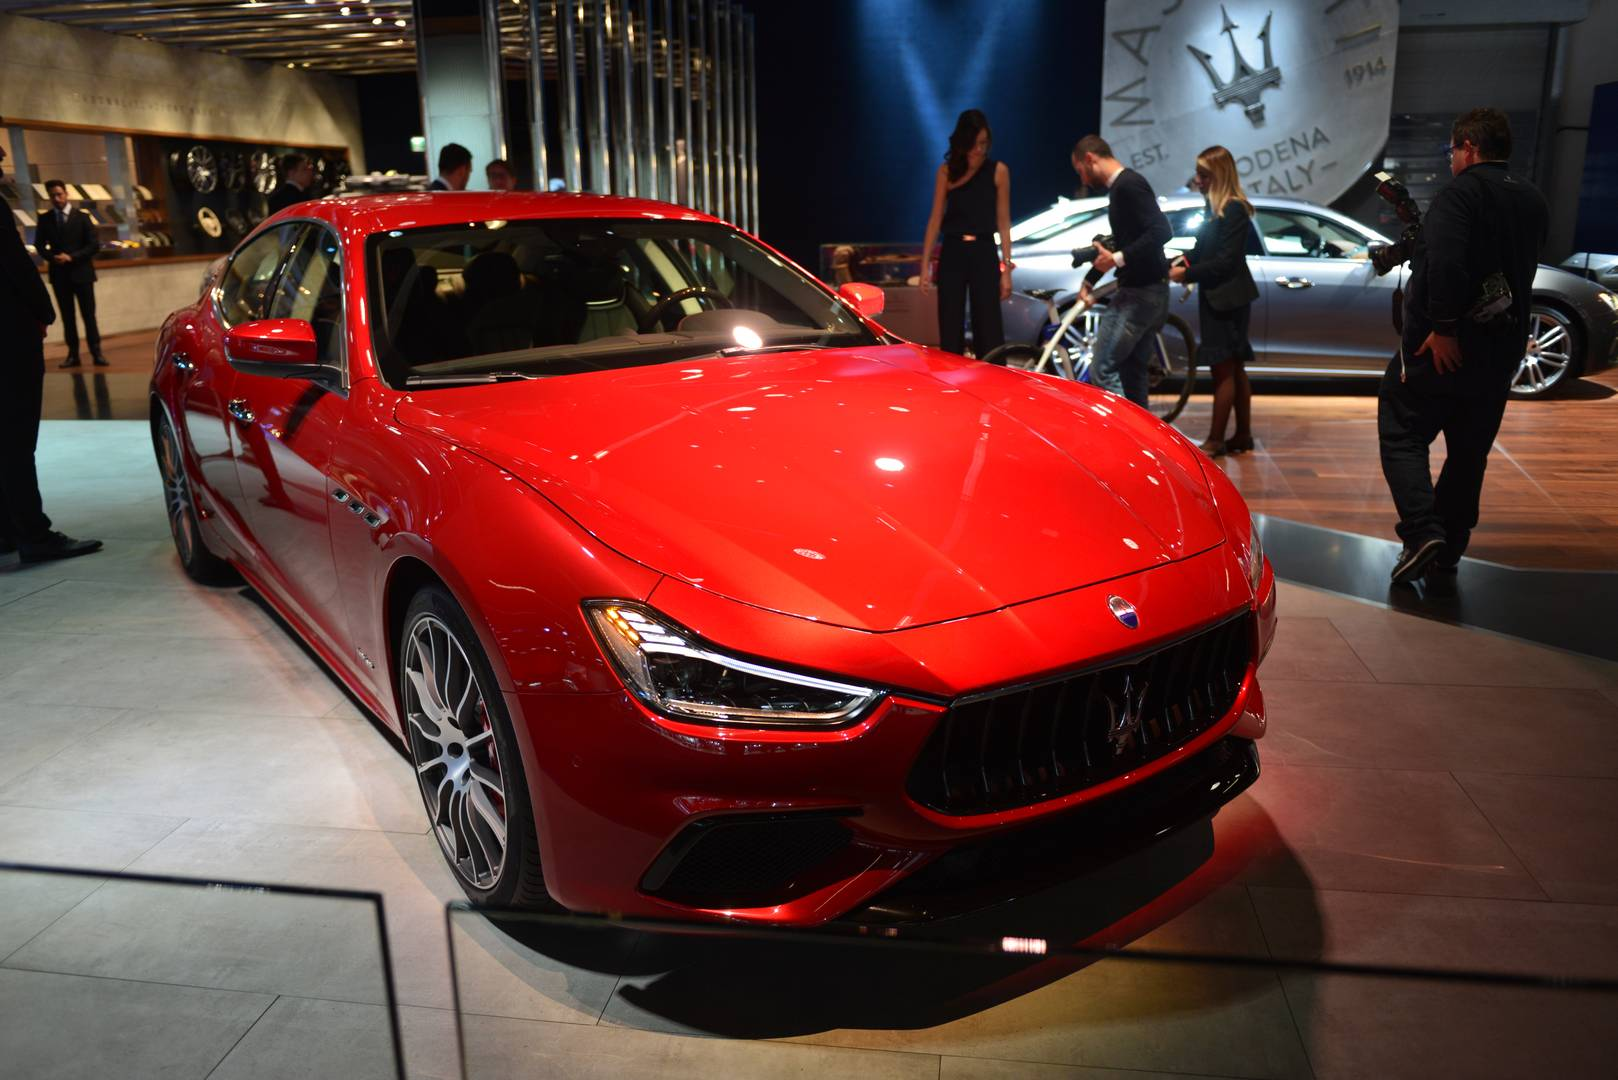 IAA Frankfurt 2017: Maserati Ghibli GranLusso